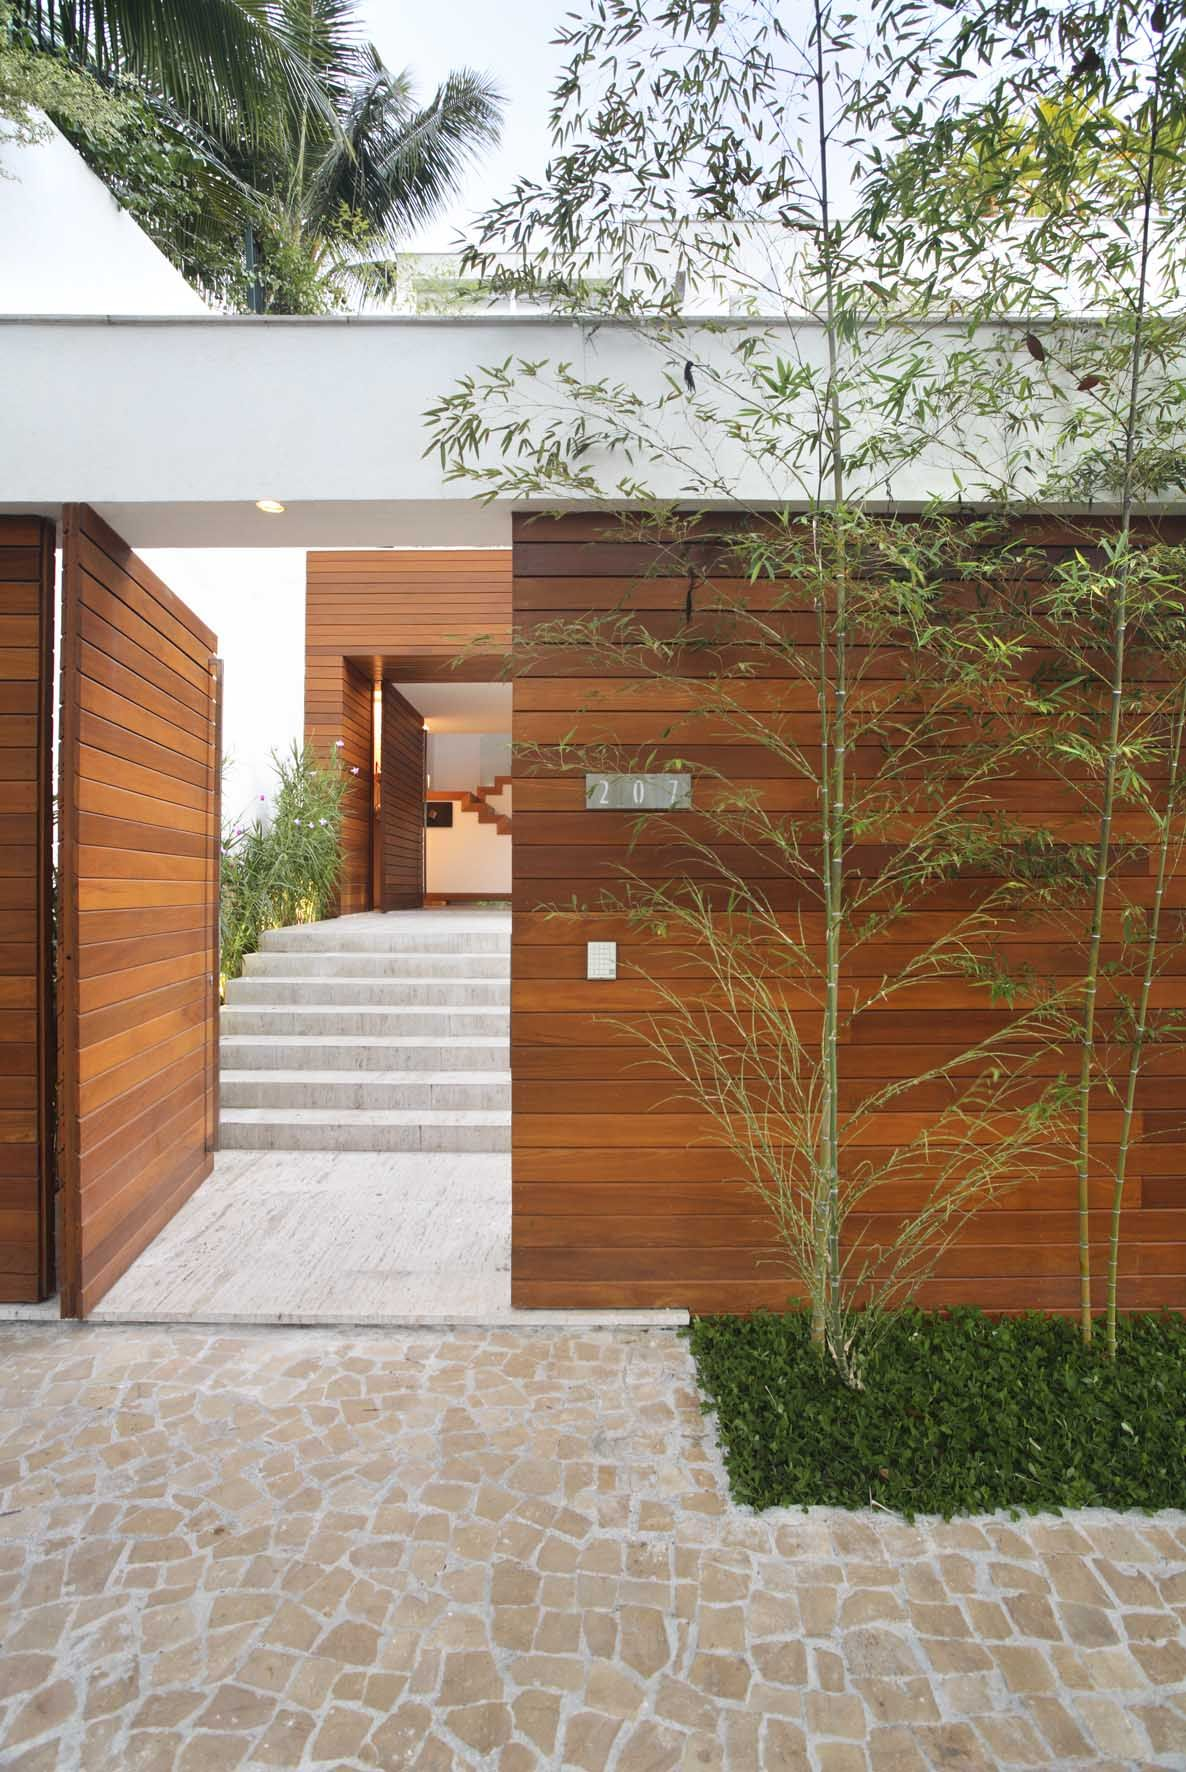 Leblon house by progetto architetura walkways pinterest house